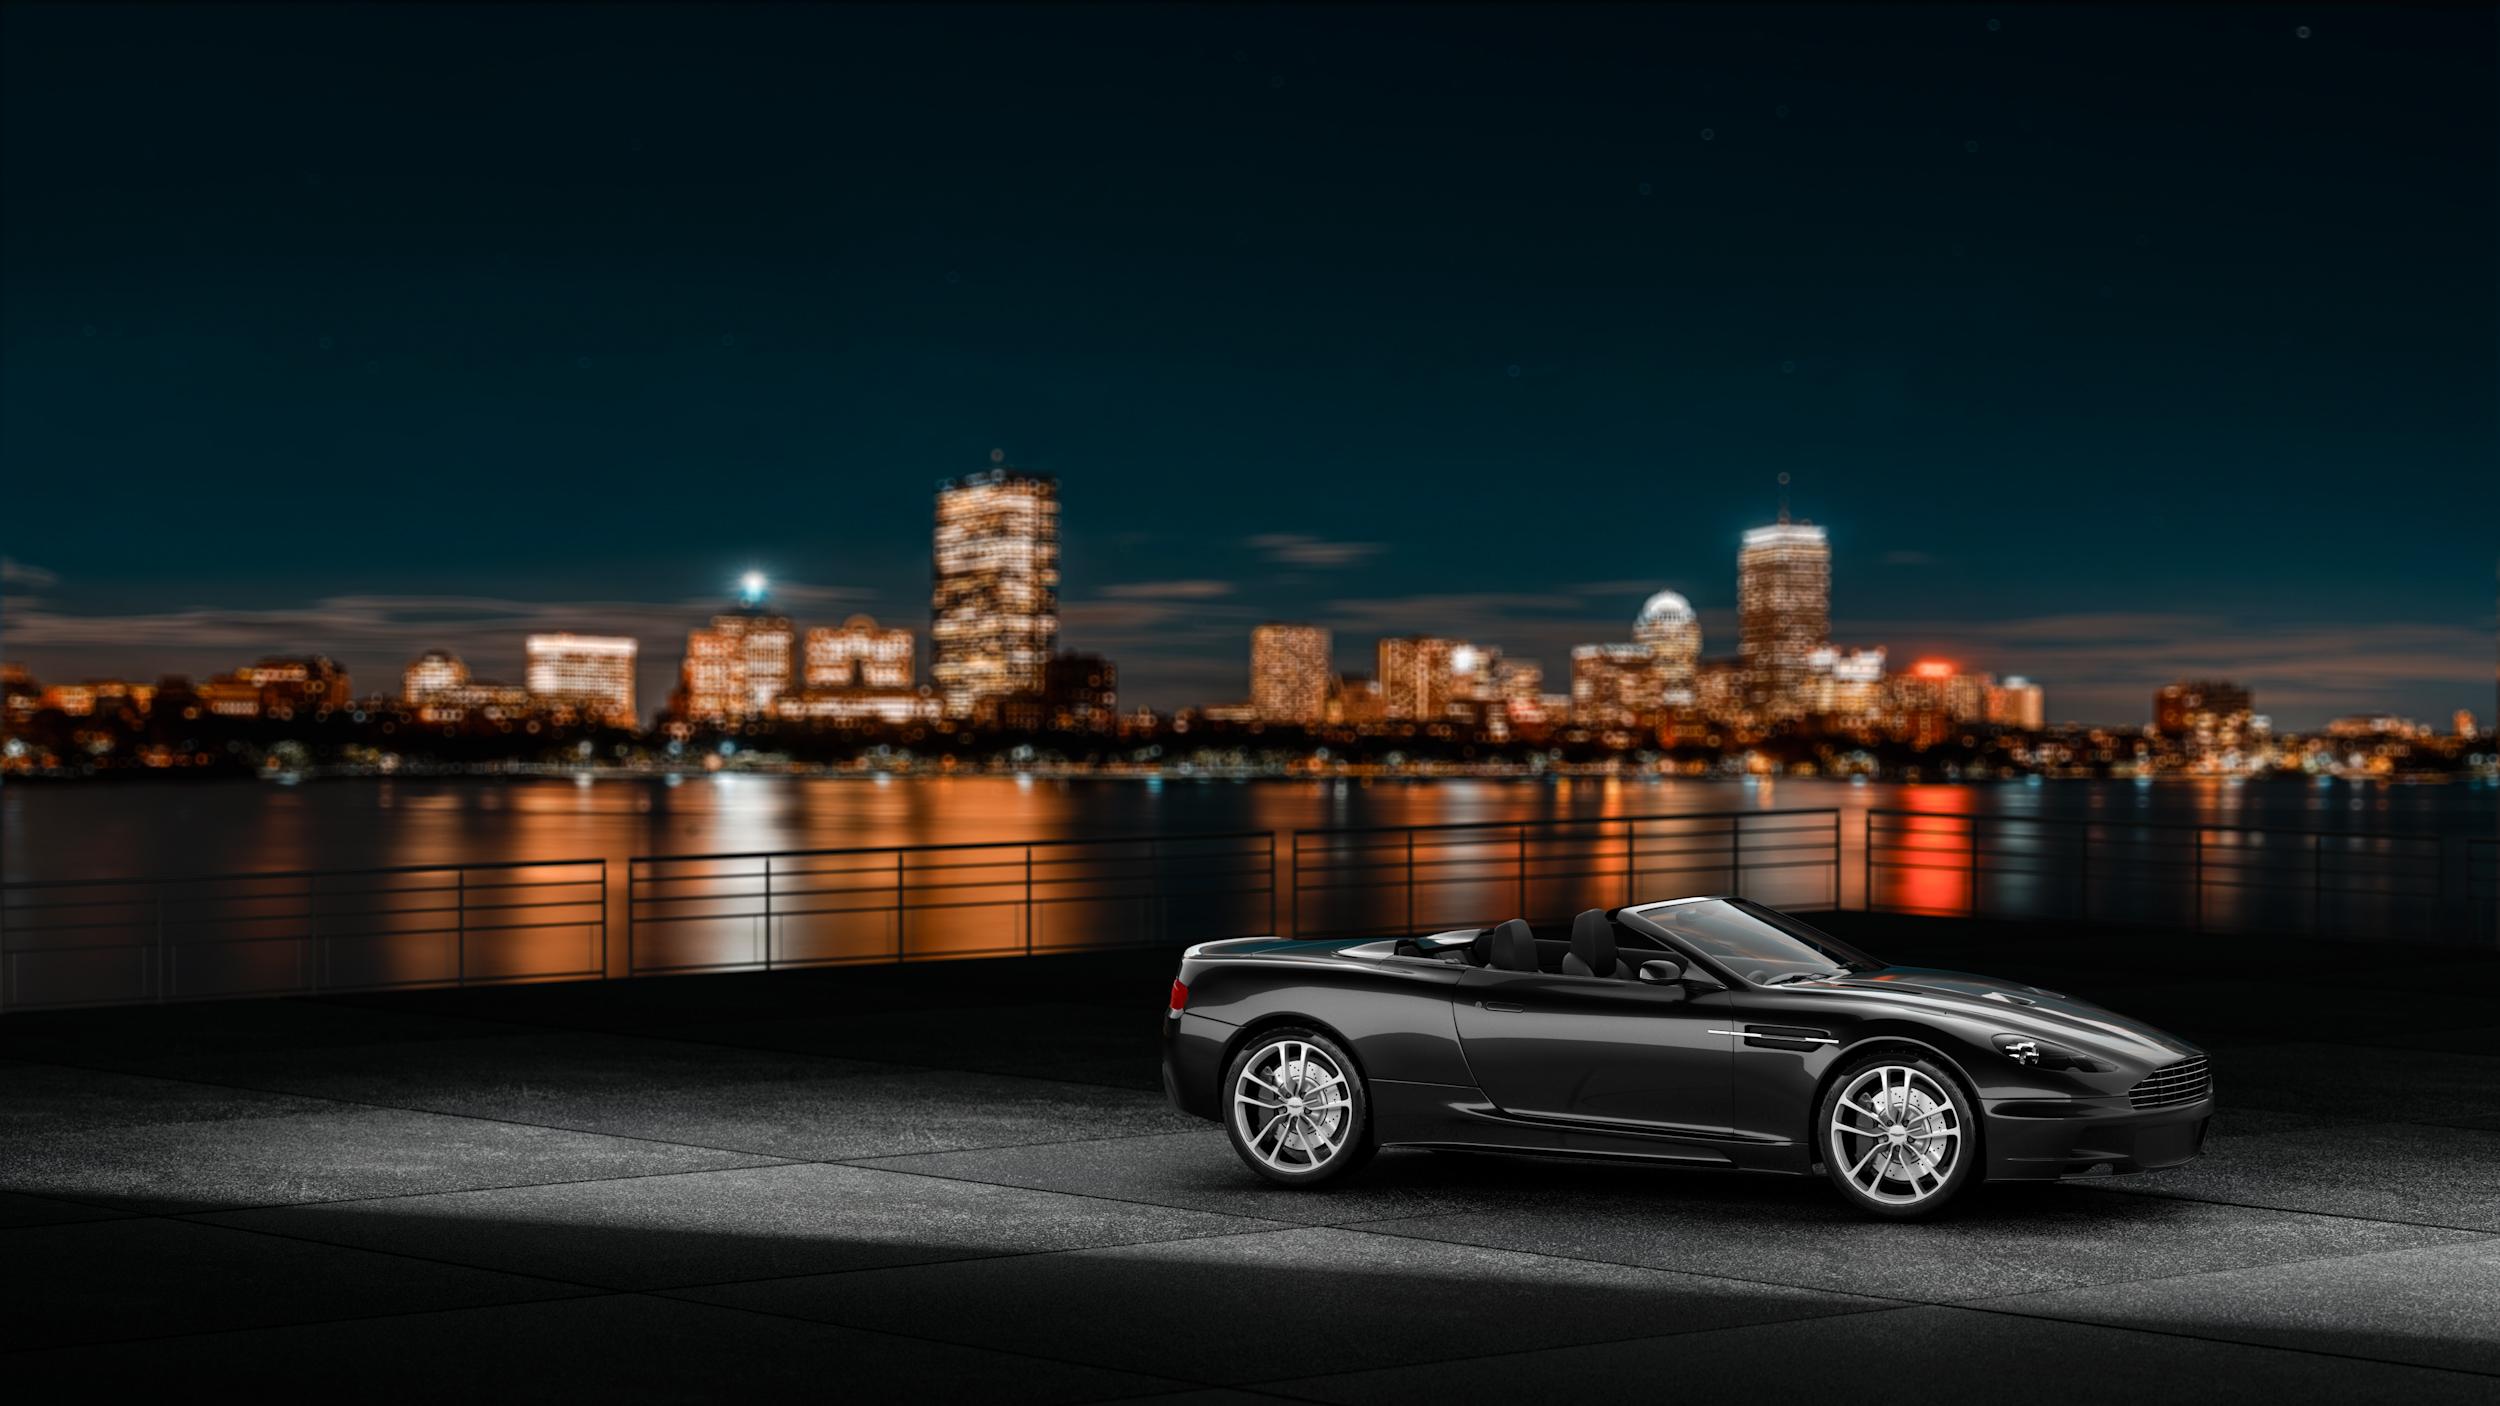 Aston Martin Volante 90mm Modo 13.0v1 v36 W DOF F1.4 Black 24h00m 97.30%.jpg